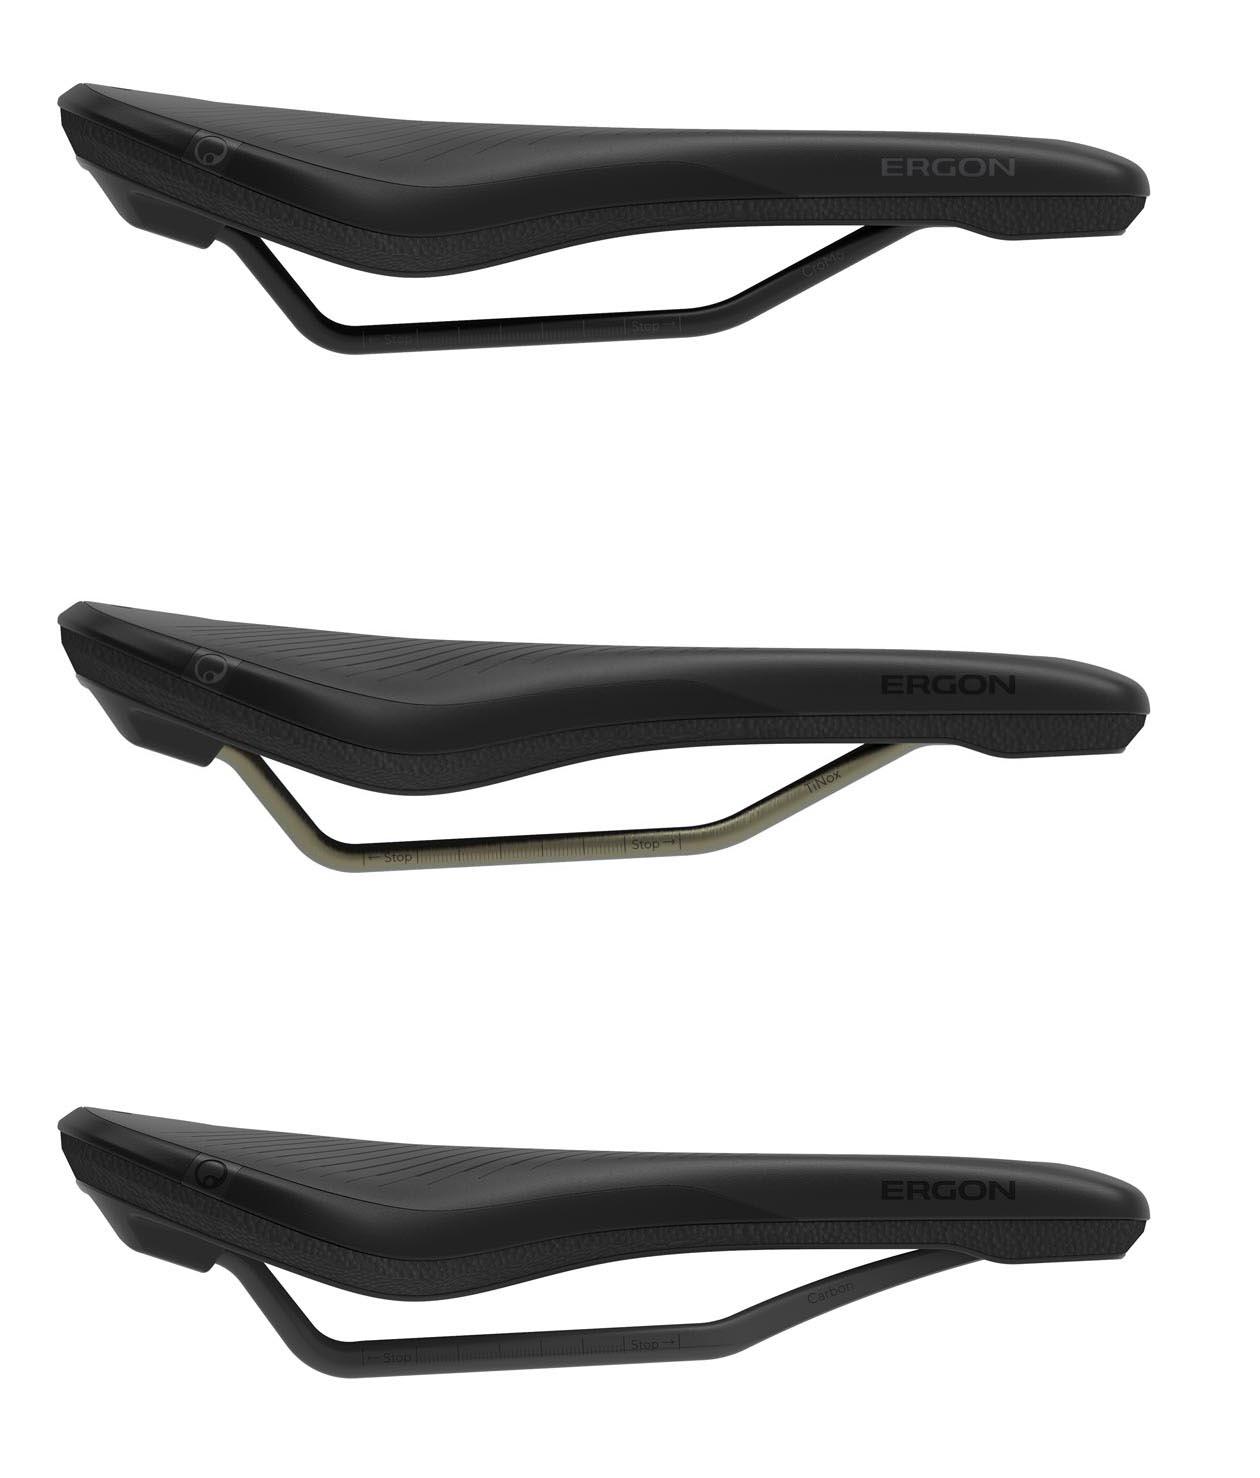 SR Allroad Core saddle models